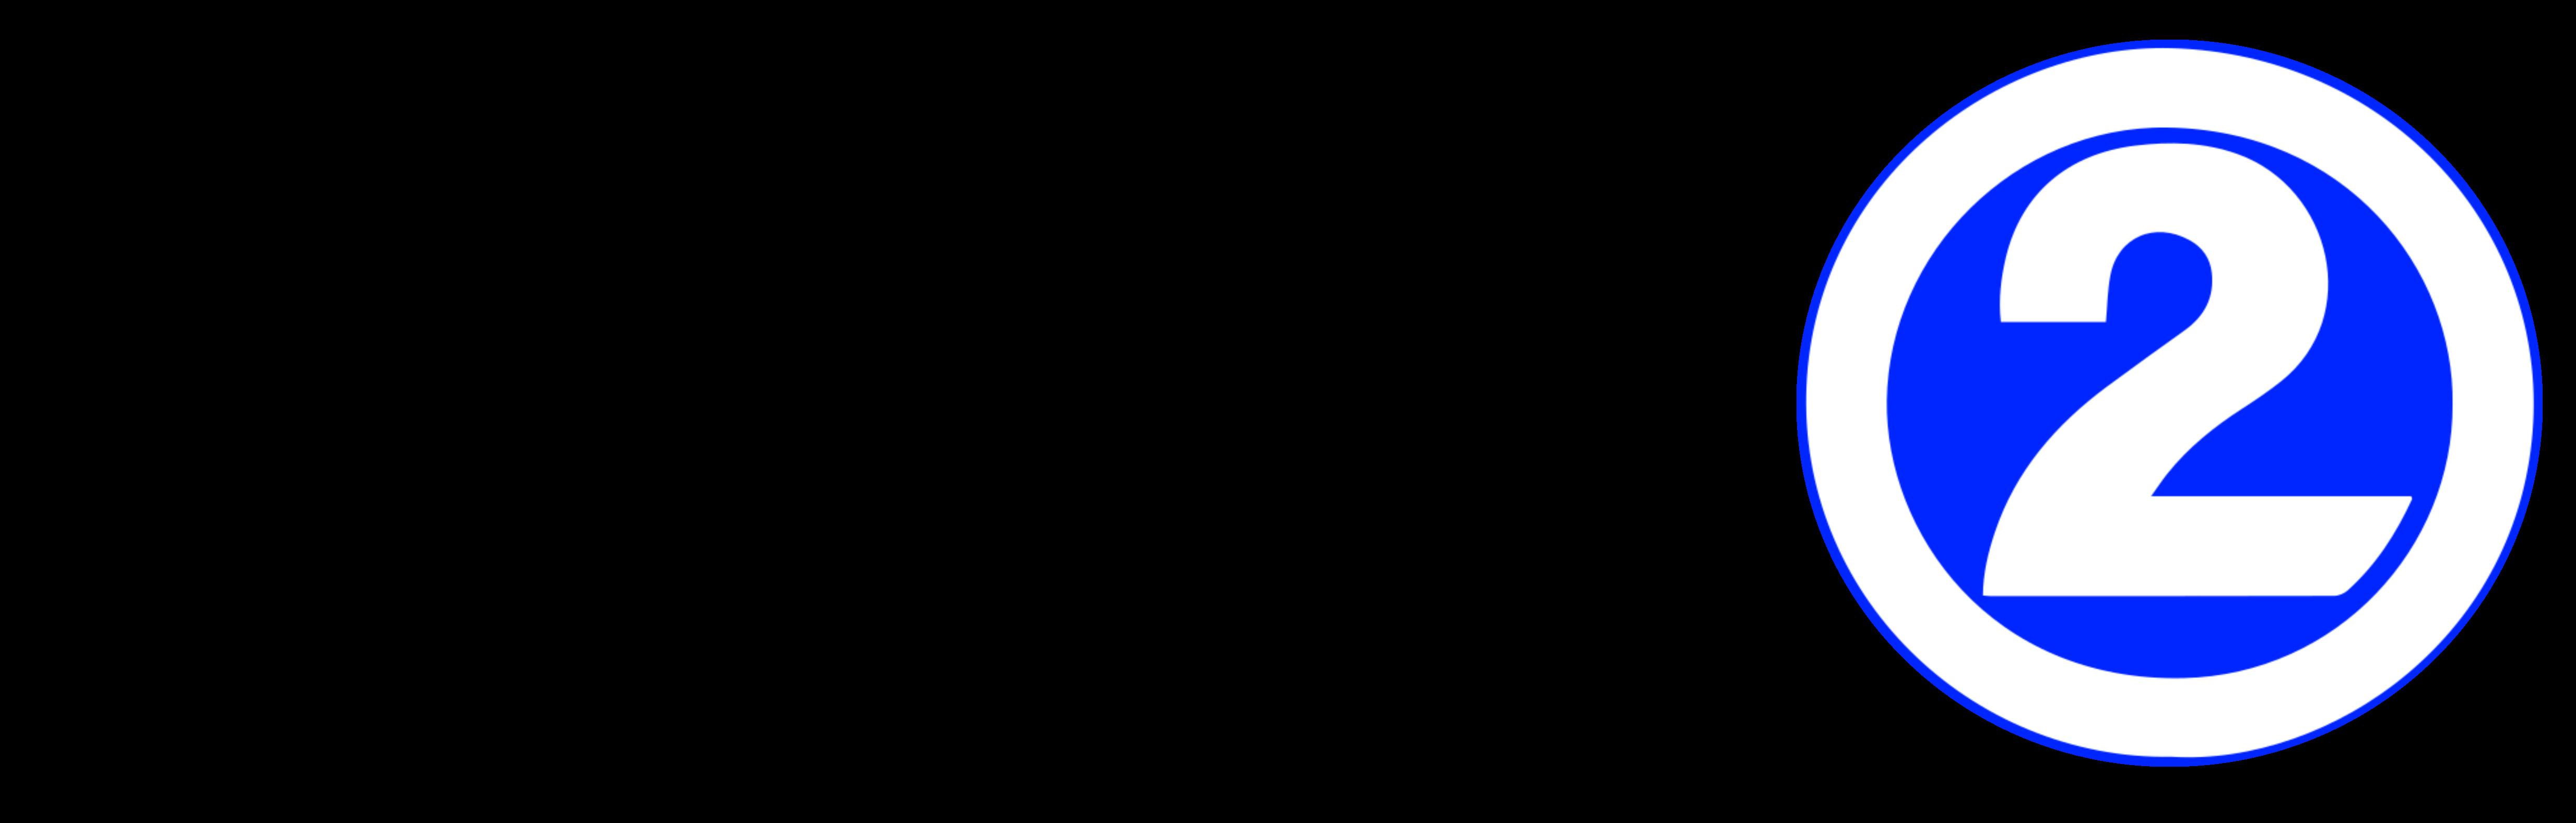 AlternateHistory.com's WBAY logo #1.png